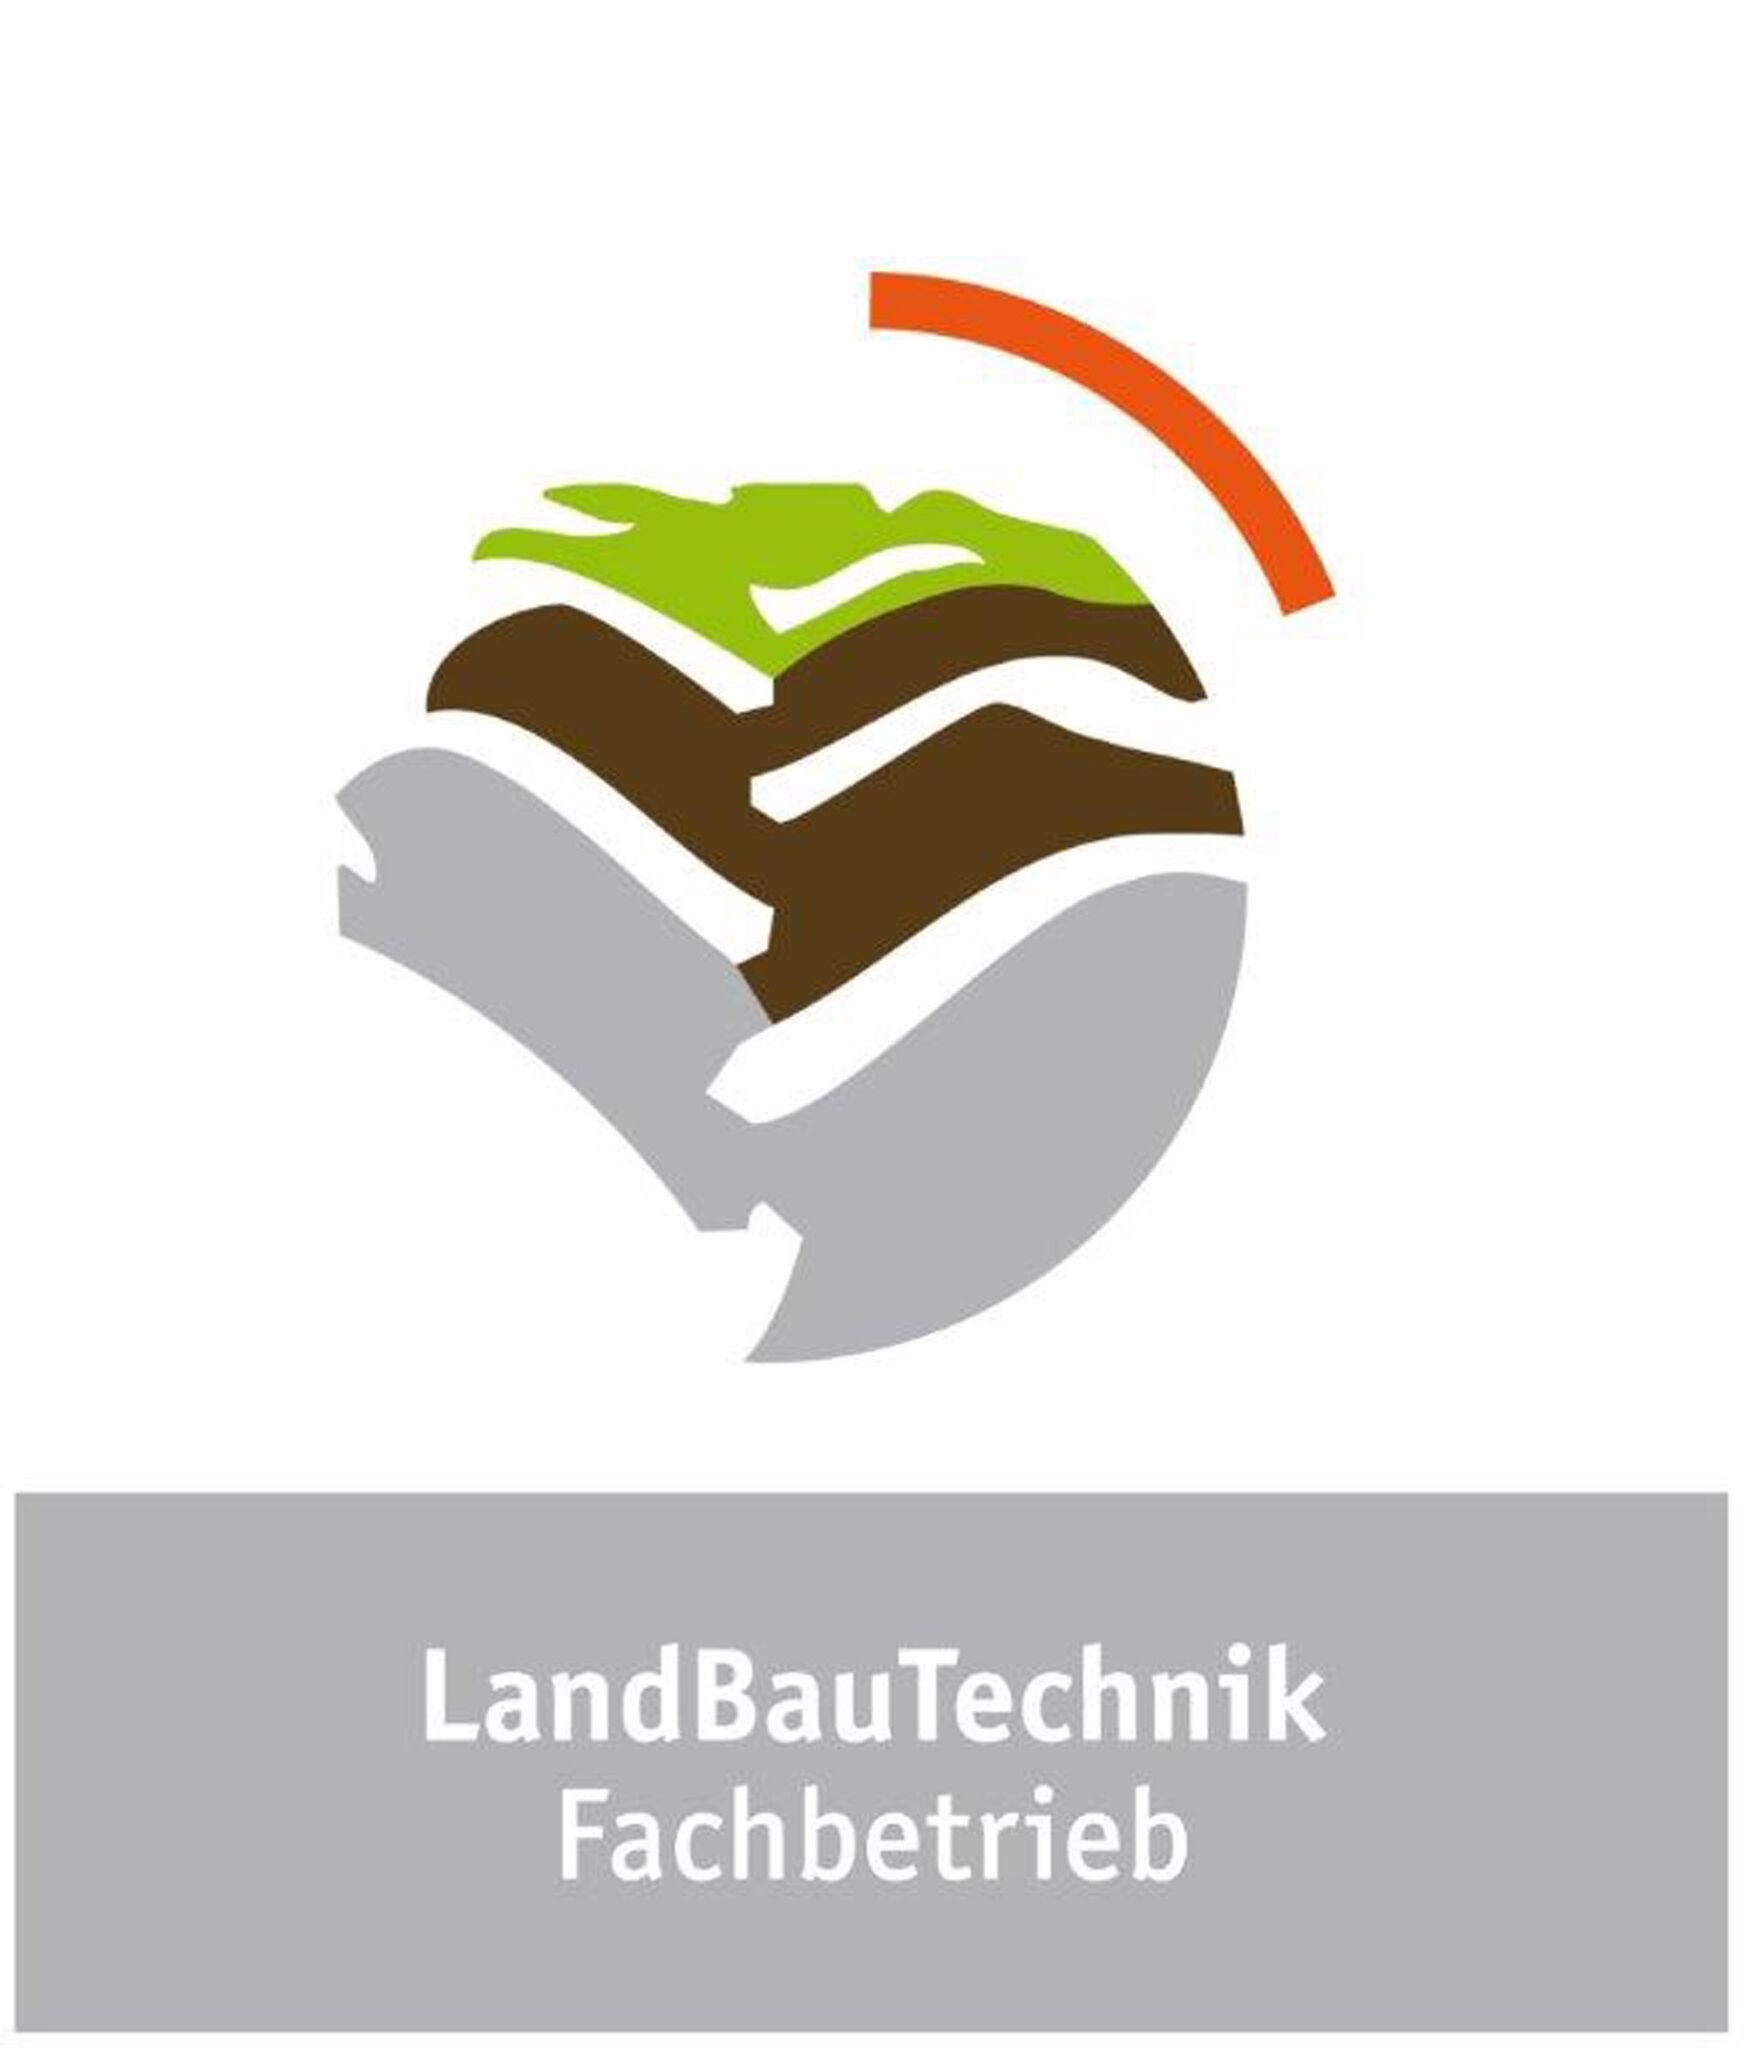 LandBauTechnik-Logo|copyright: Bundesverband LandBauTechnik e.V.